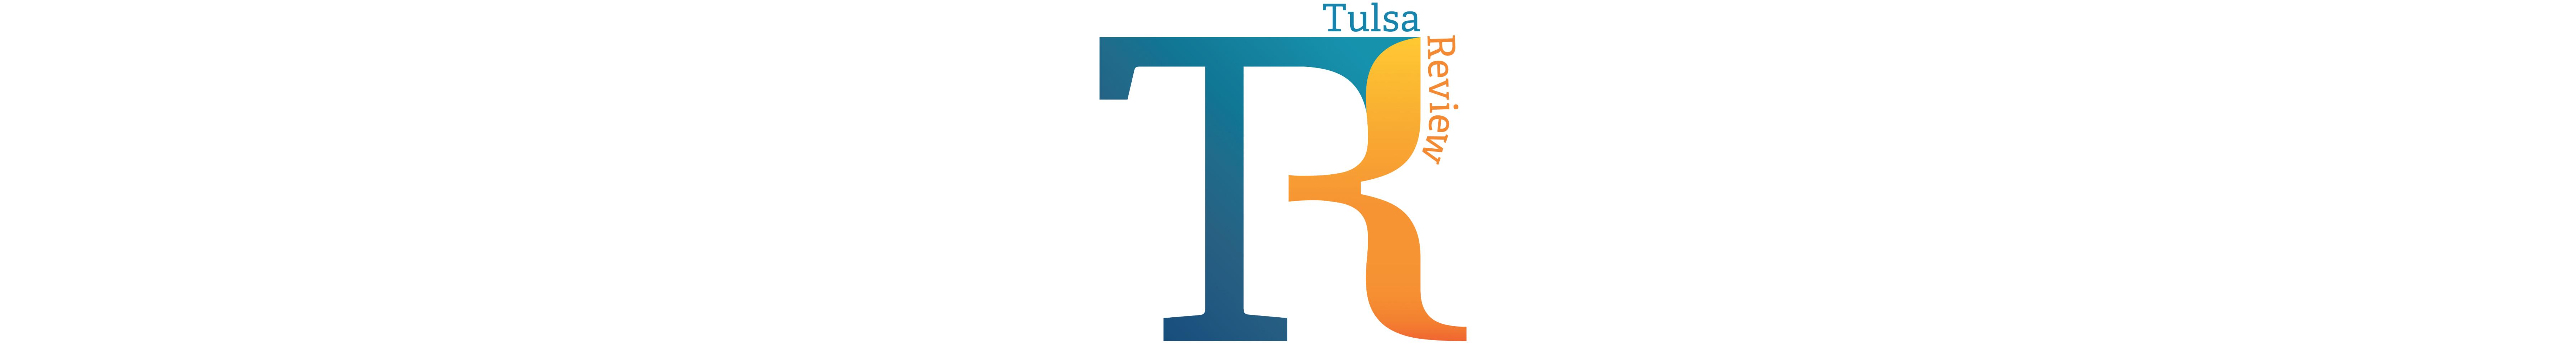 Tulsa Review